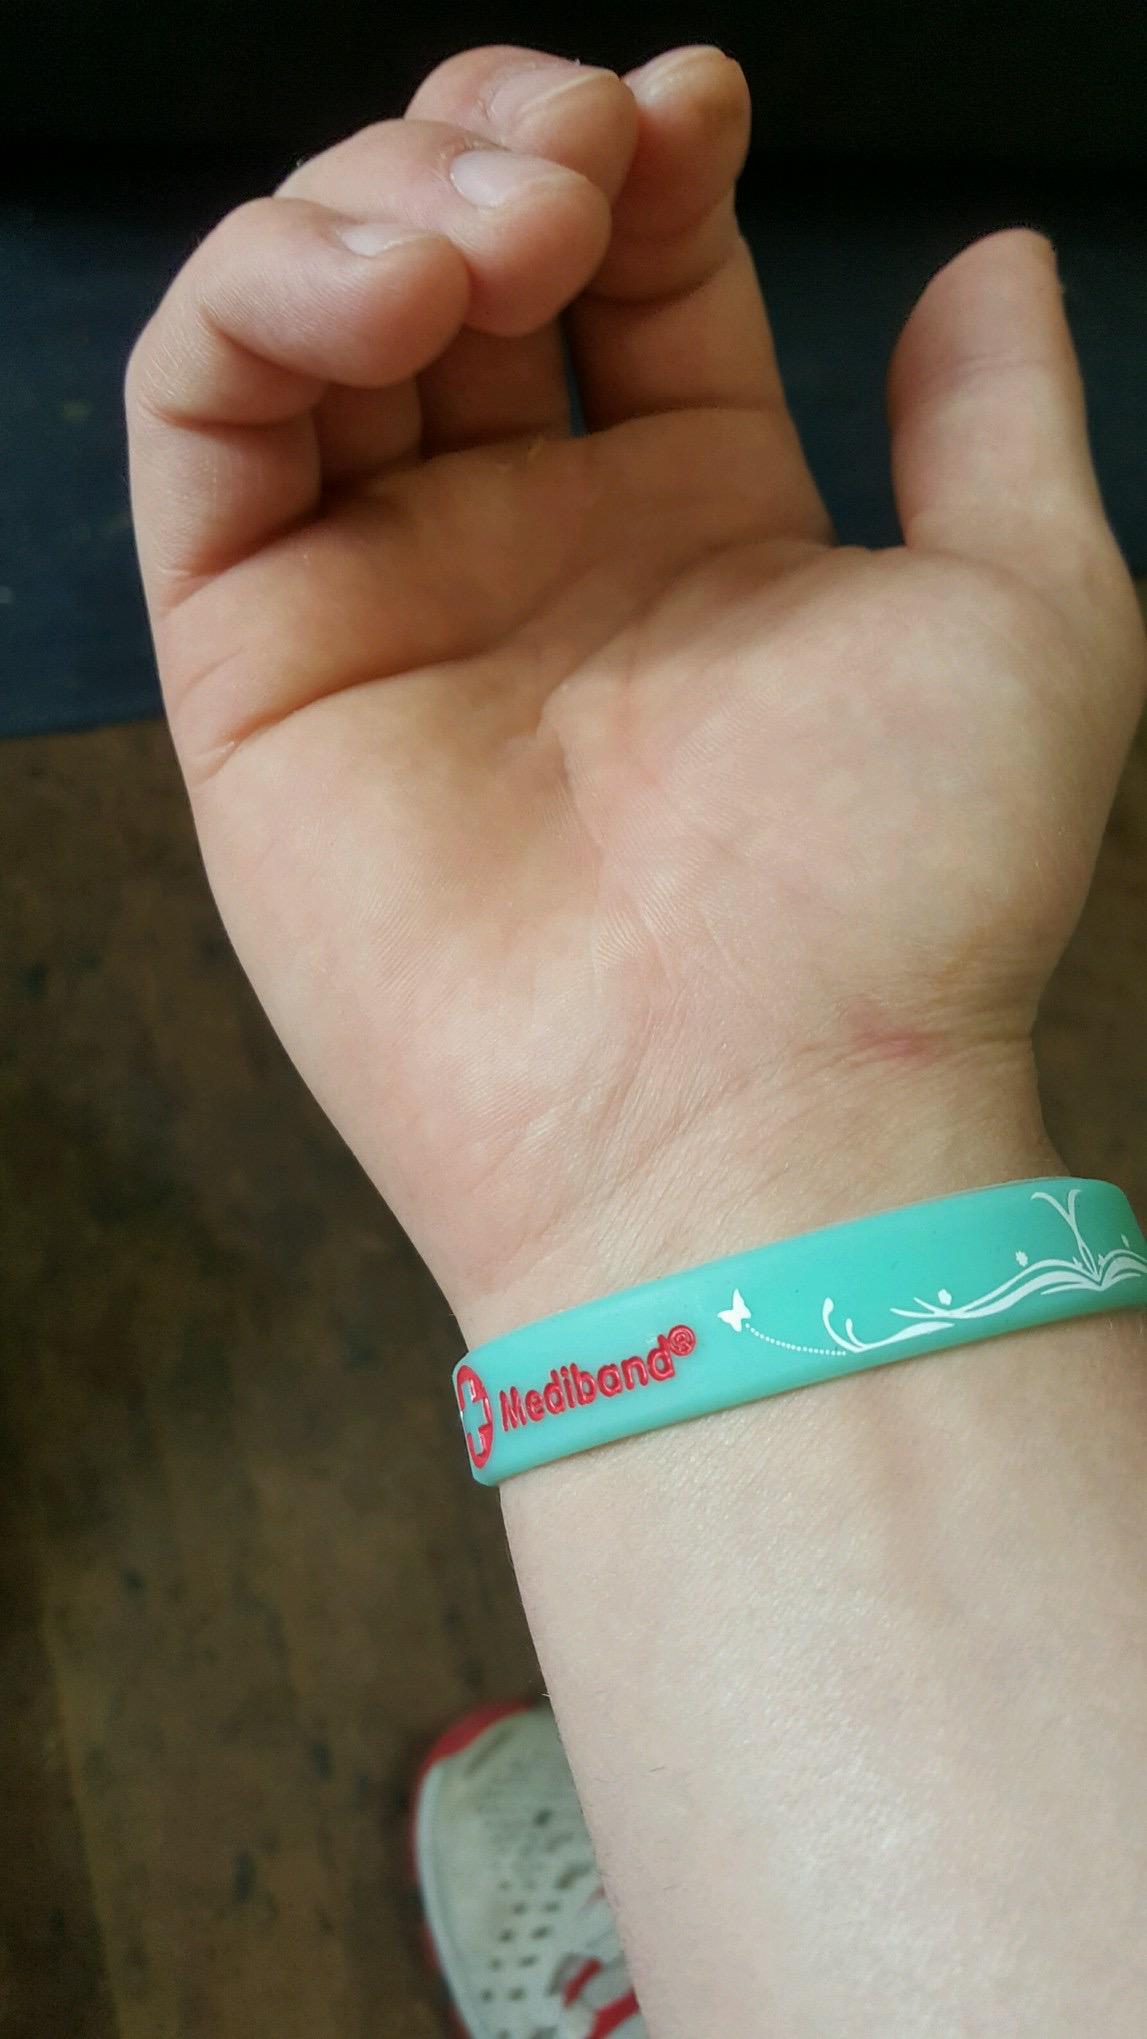 Mediband Asthma Medical Id Bracelet